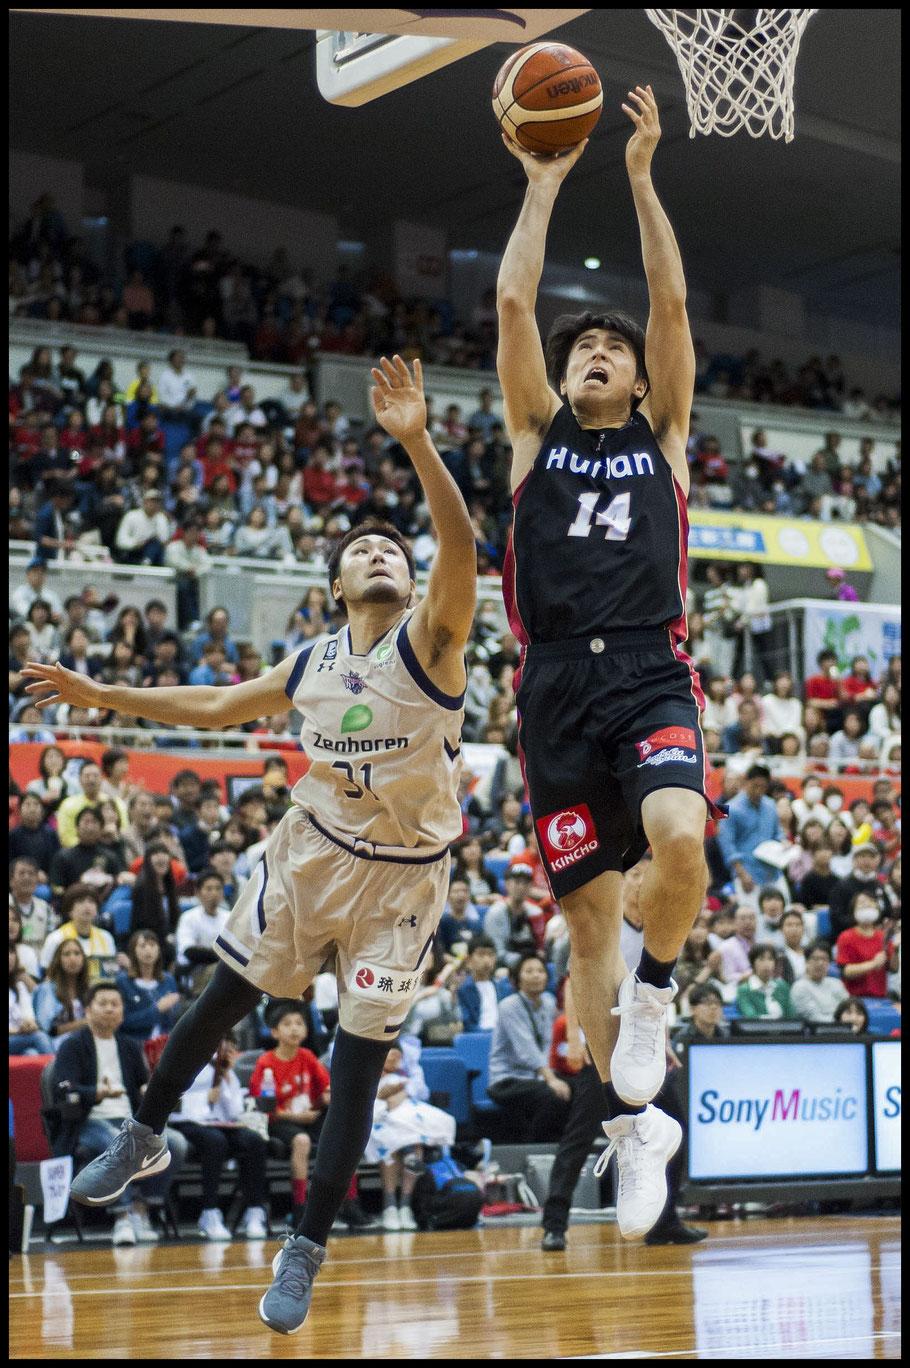 Osaka Evessa's Takuya Hashimoto scored 14 points against Ryukyu Golden Kings — Lionel Piguet, Inside Sport: Japan, April 23, 2017